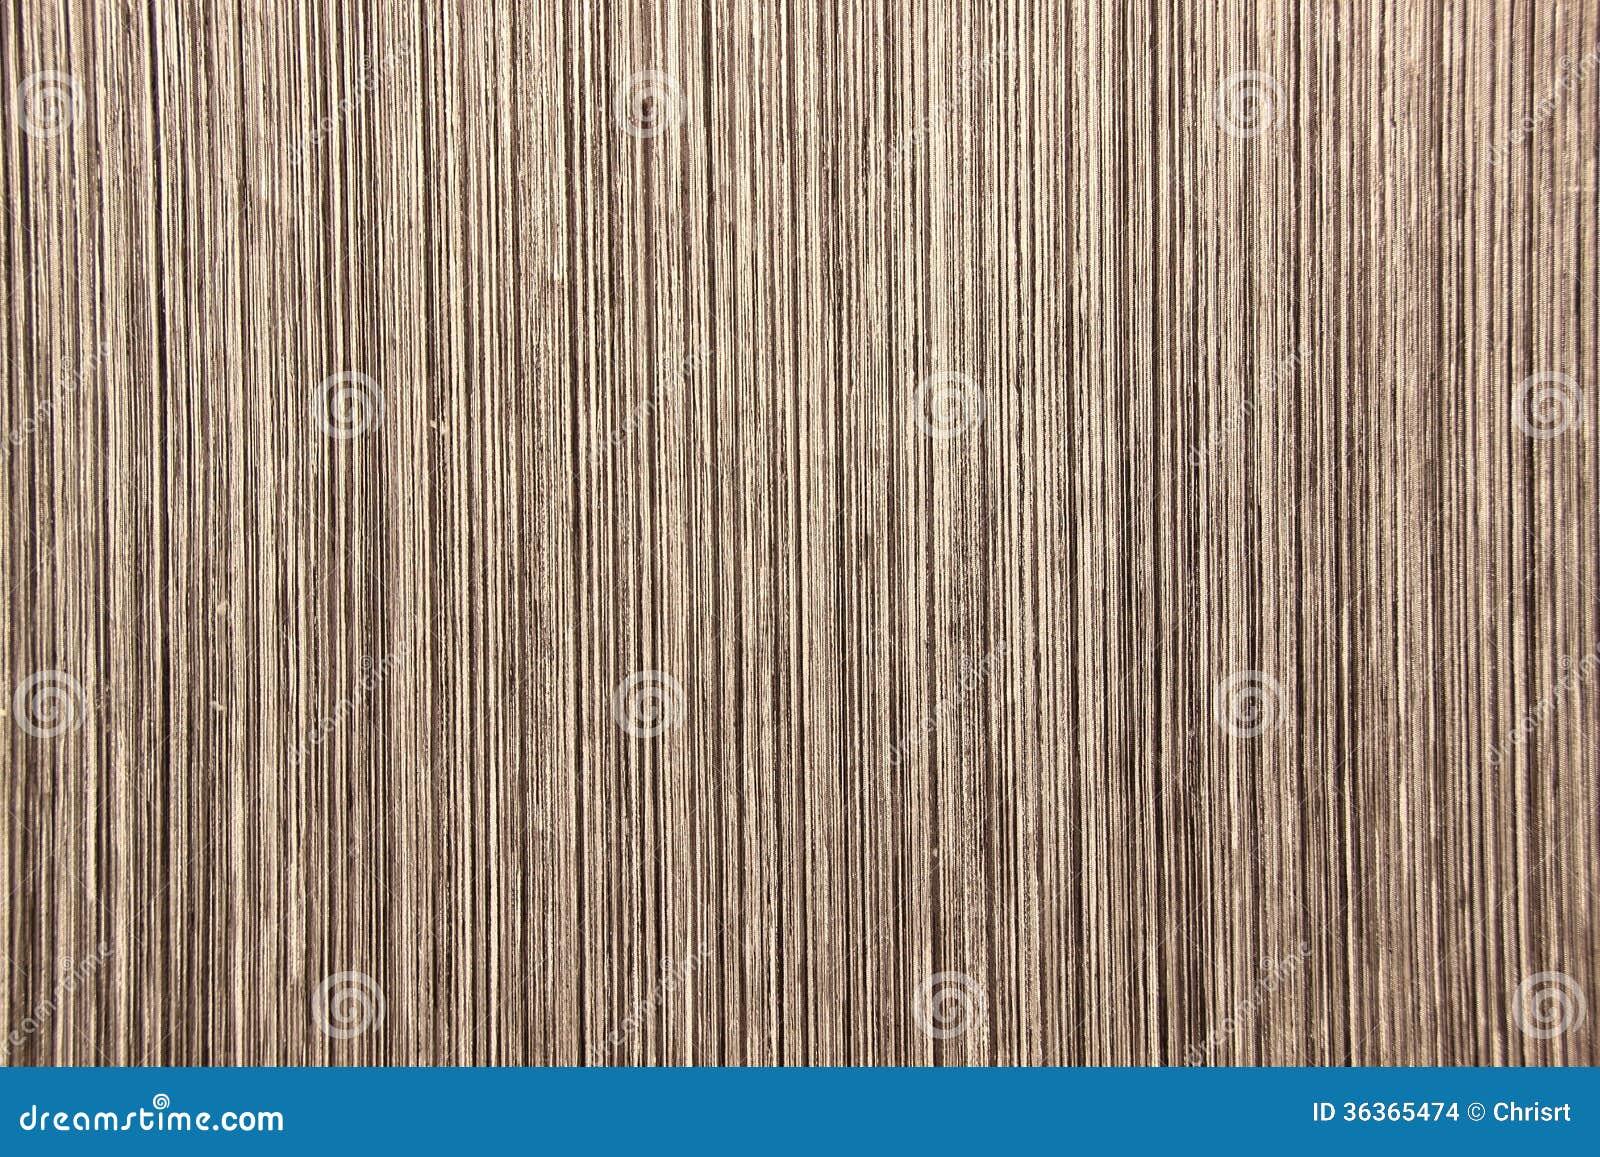 Closeup of old oak wood ship plank stock images image